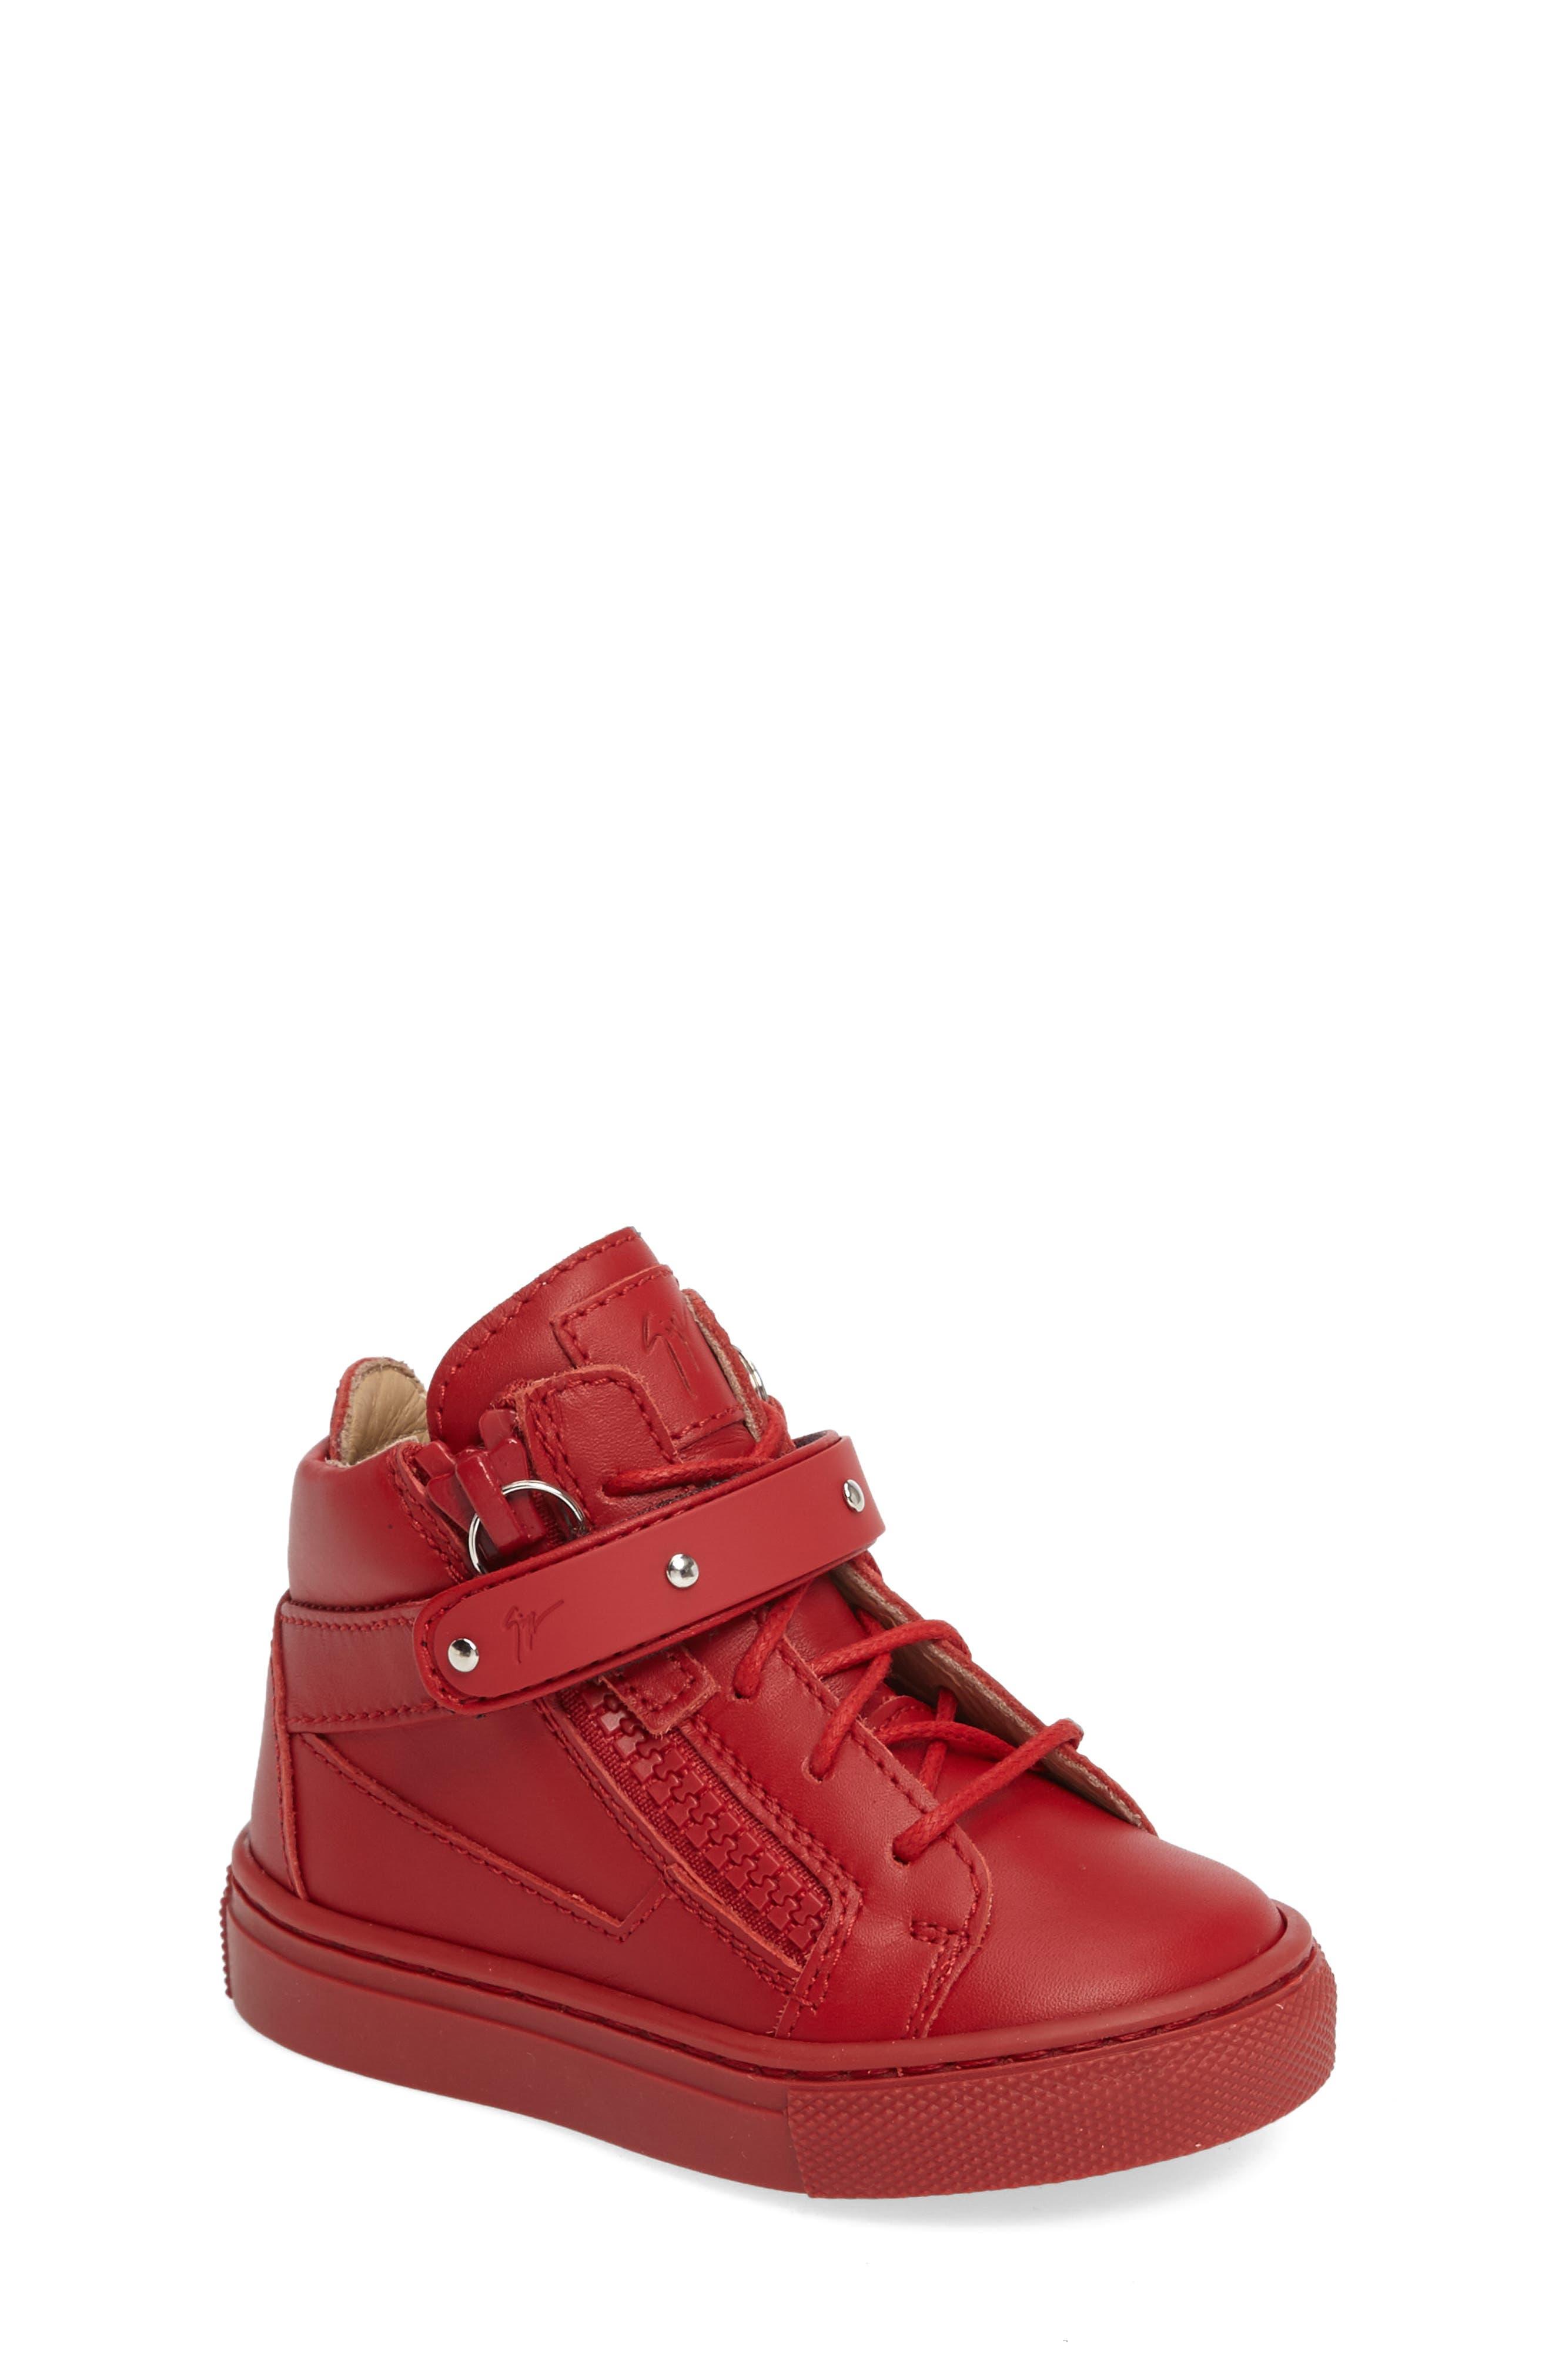 Taylor Junior High Top Sneaker,                             Main thumbnail 1, color,                             600